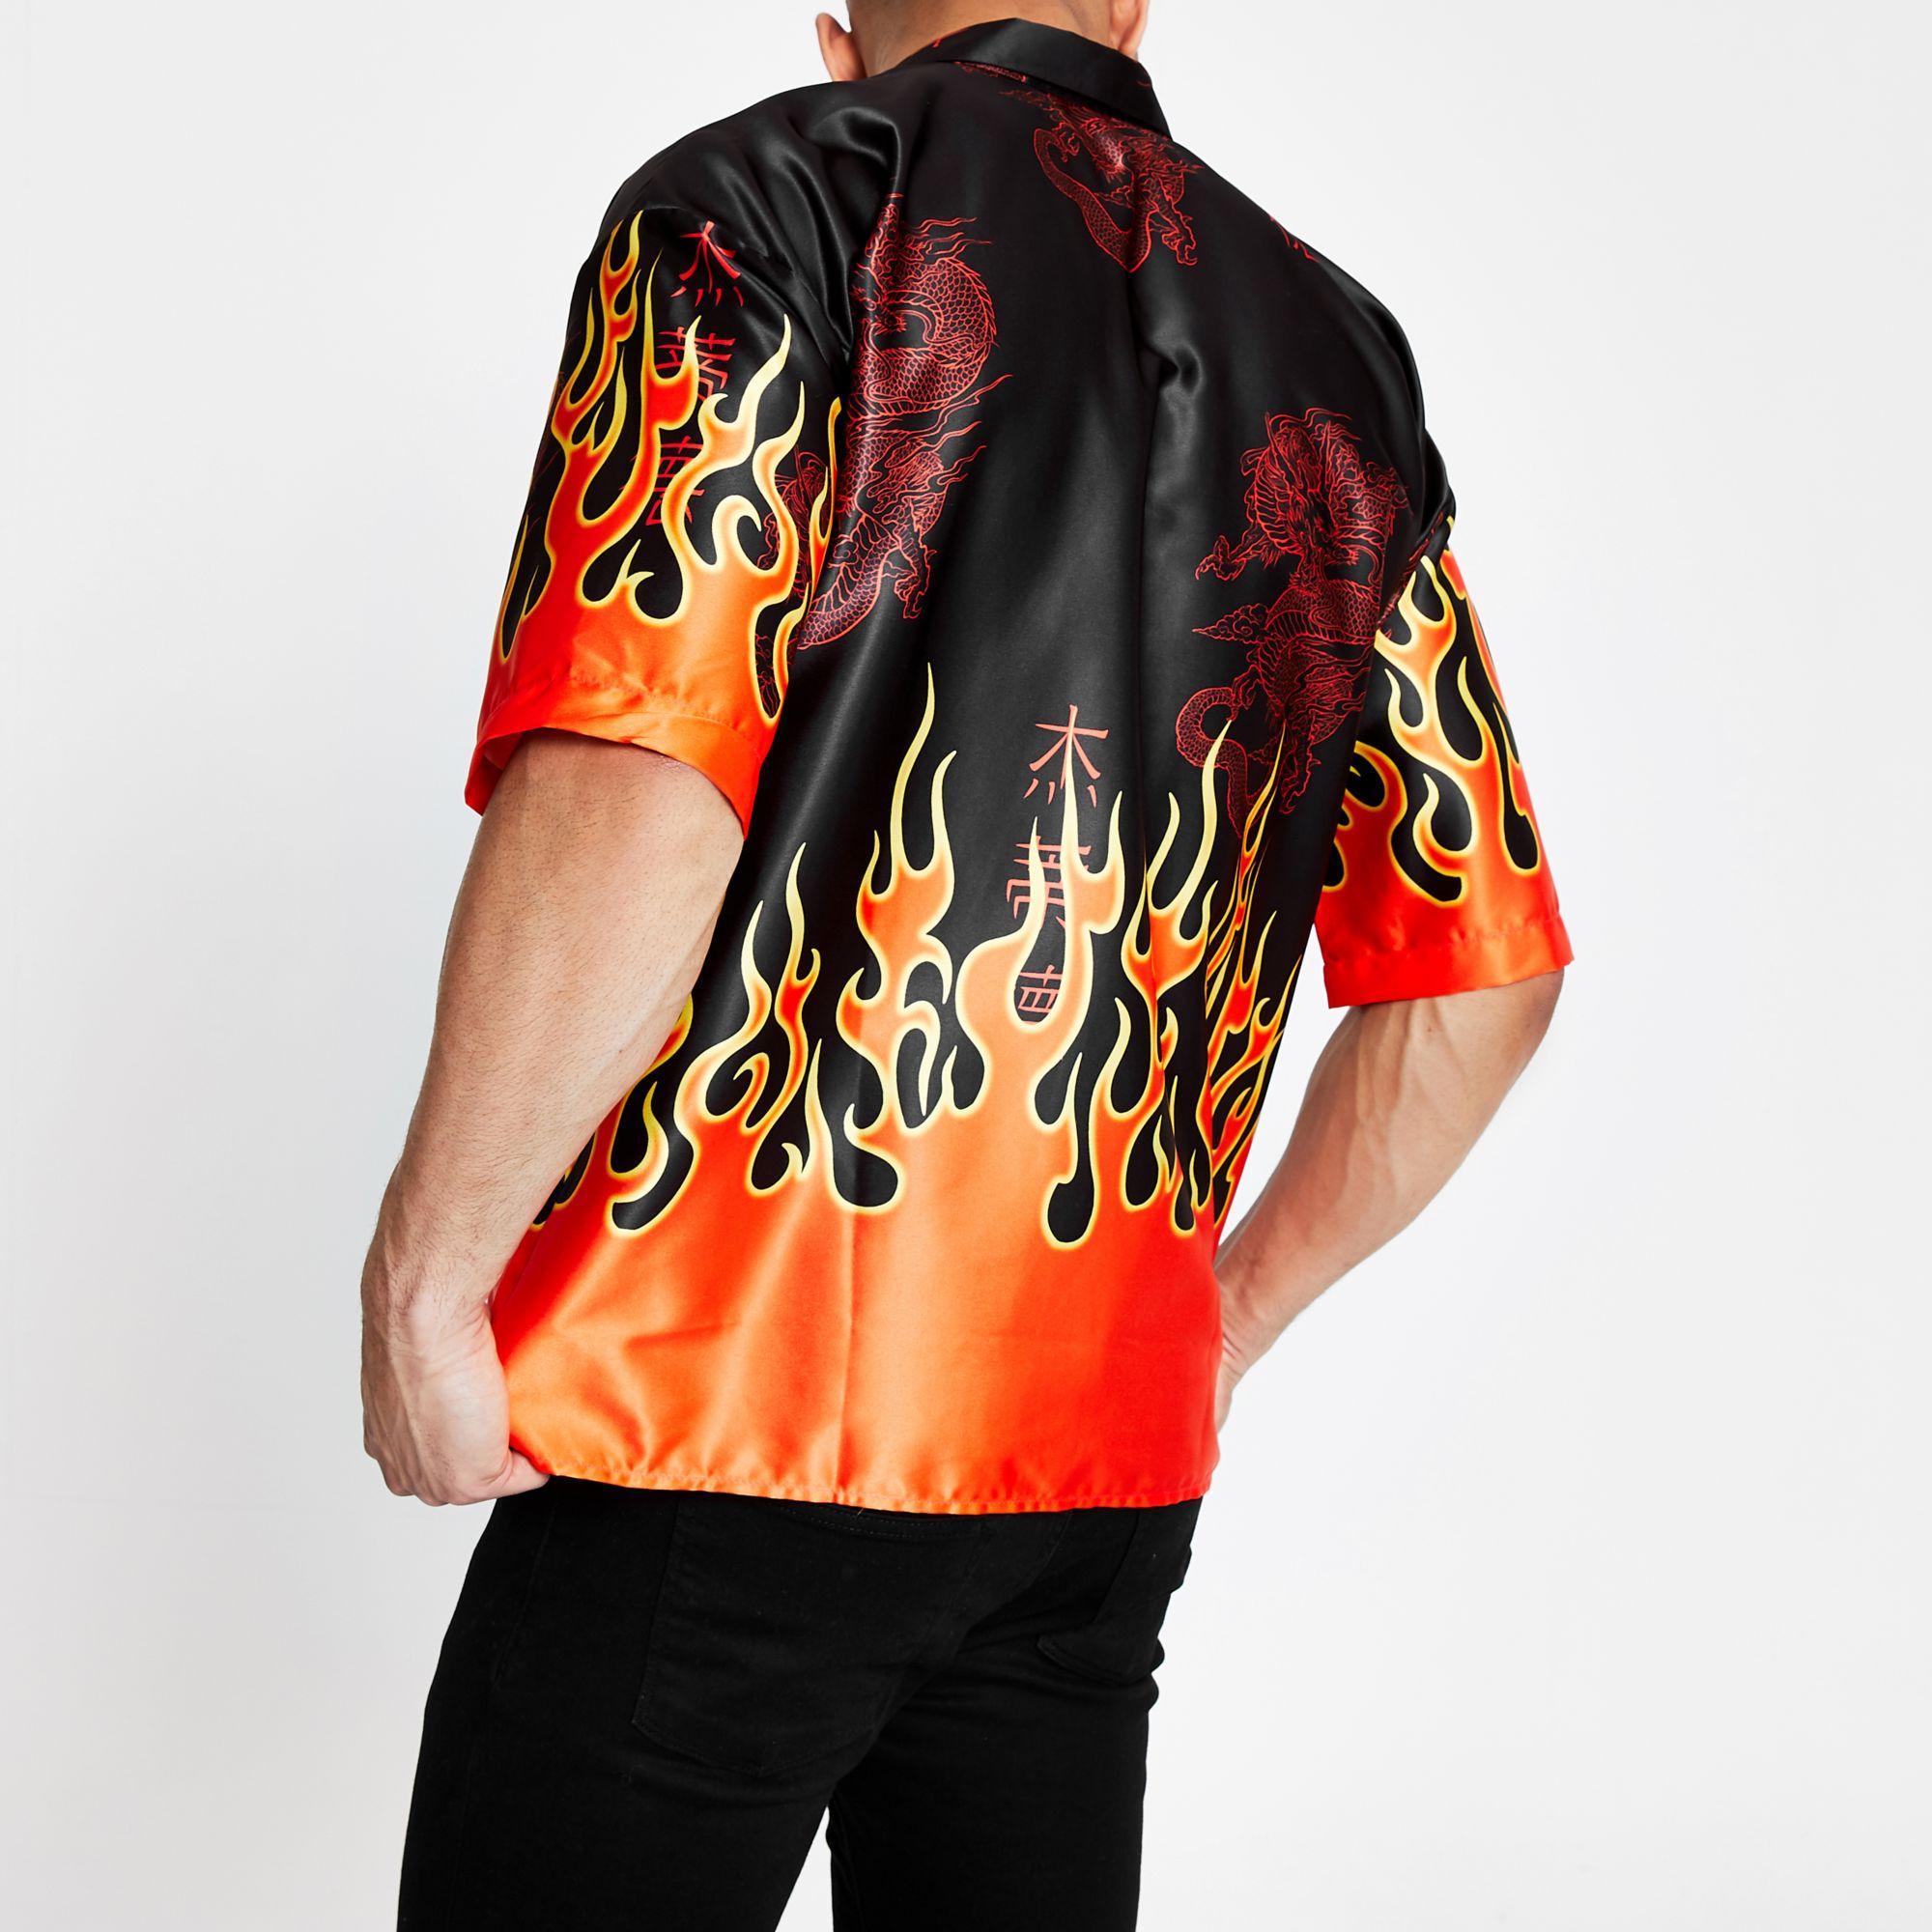 1340436ce42 River Island - Jaded London Black Flame Short Sleeve Shirt for Men - Lyst.  View fullscreen